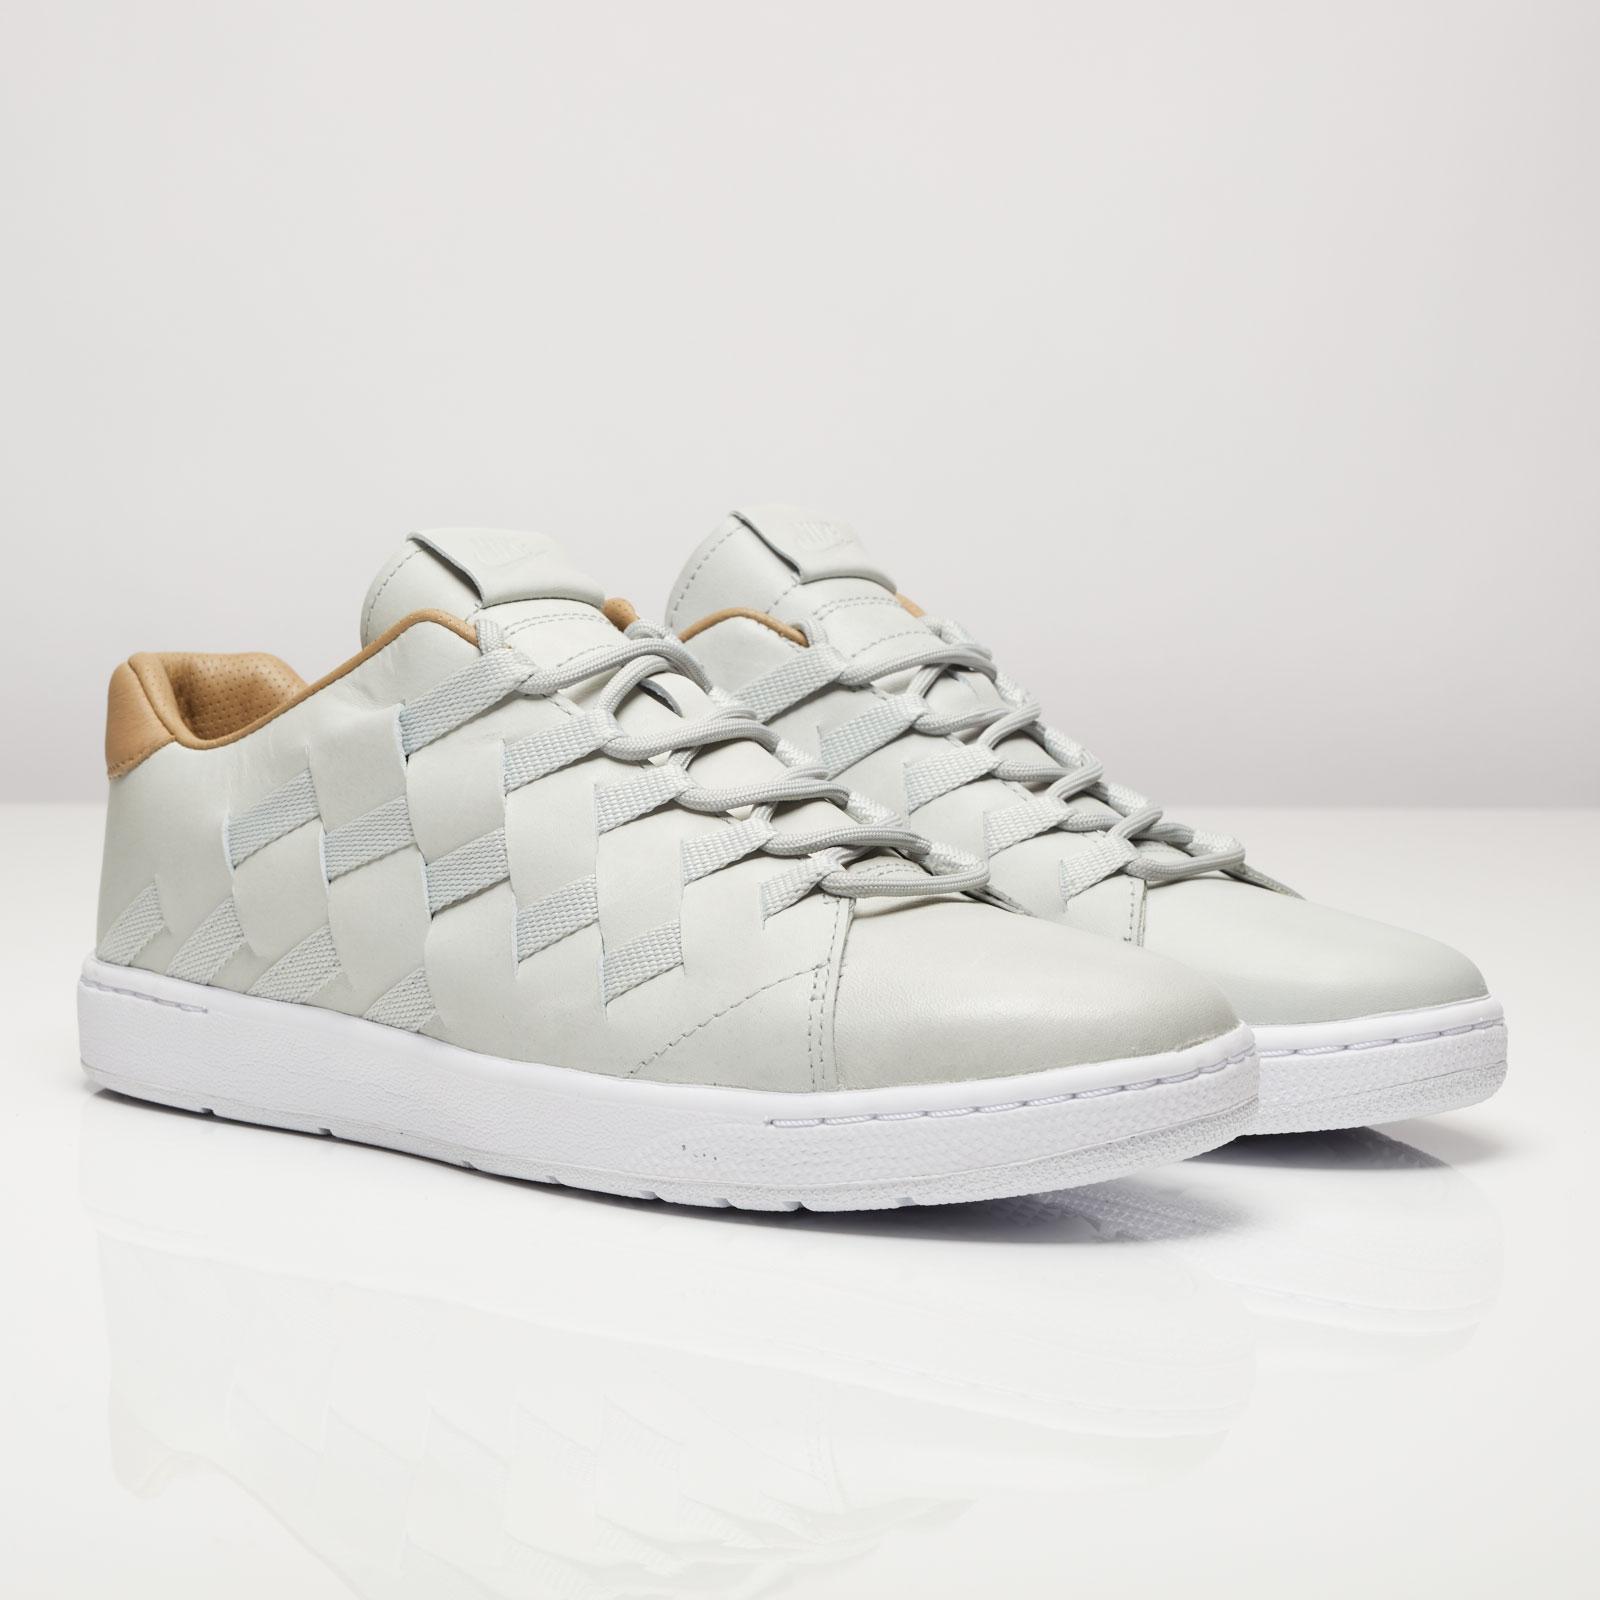 62cb9288824c Nike Tennis Classic Ultra Premium QS - 830699-003 - Sneakersnstuff ...